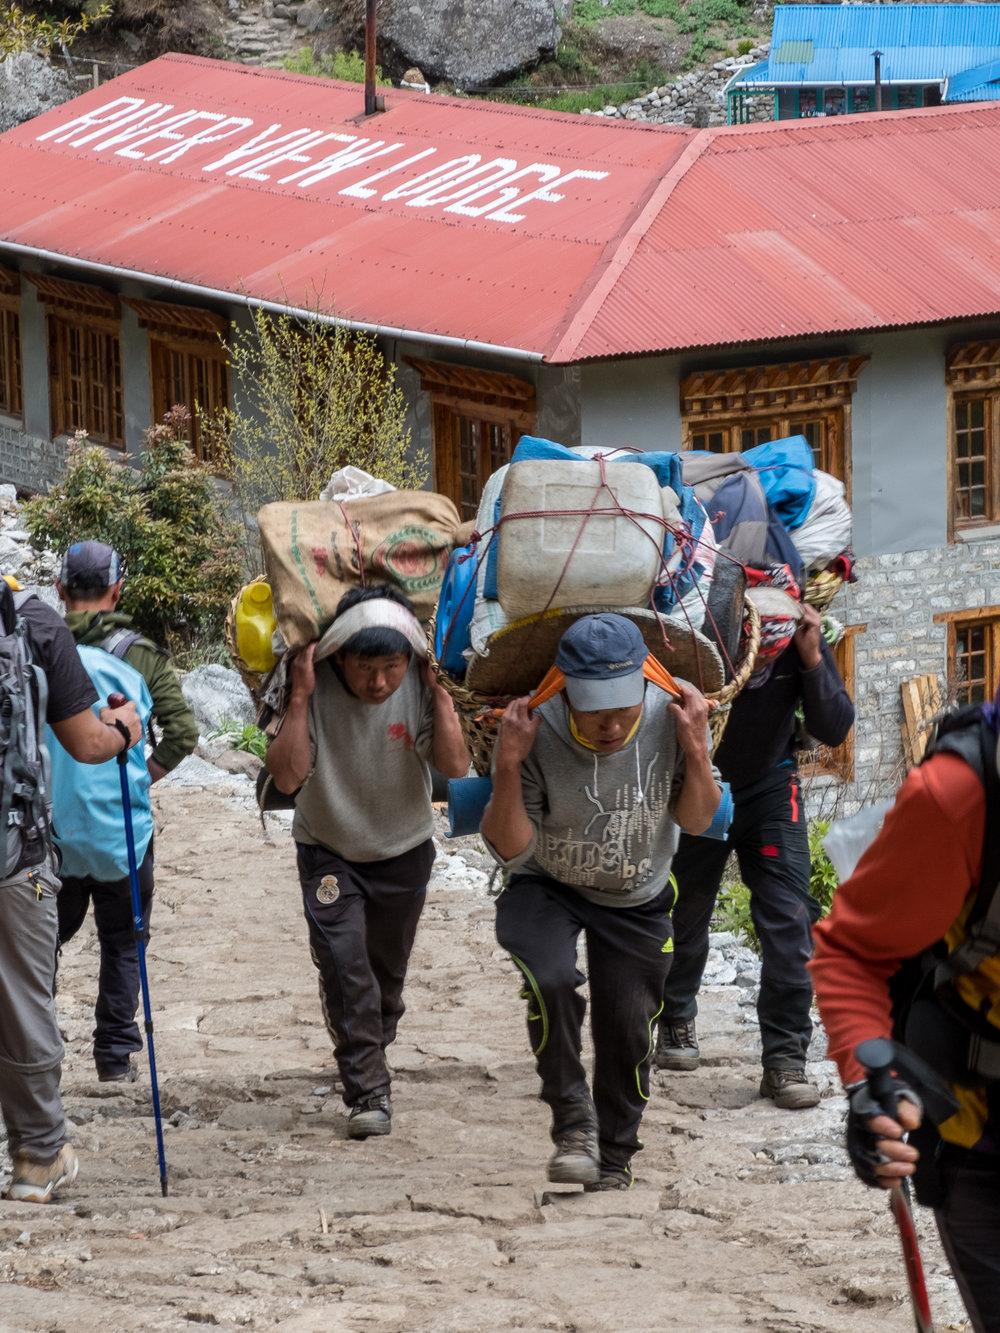 Porters hauling goods in the Khumbu Region, Nepal.